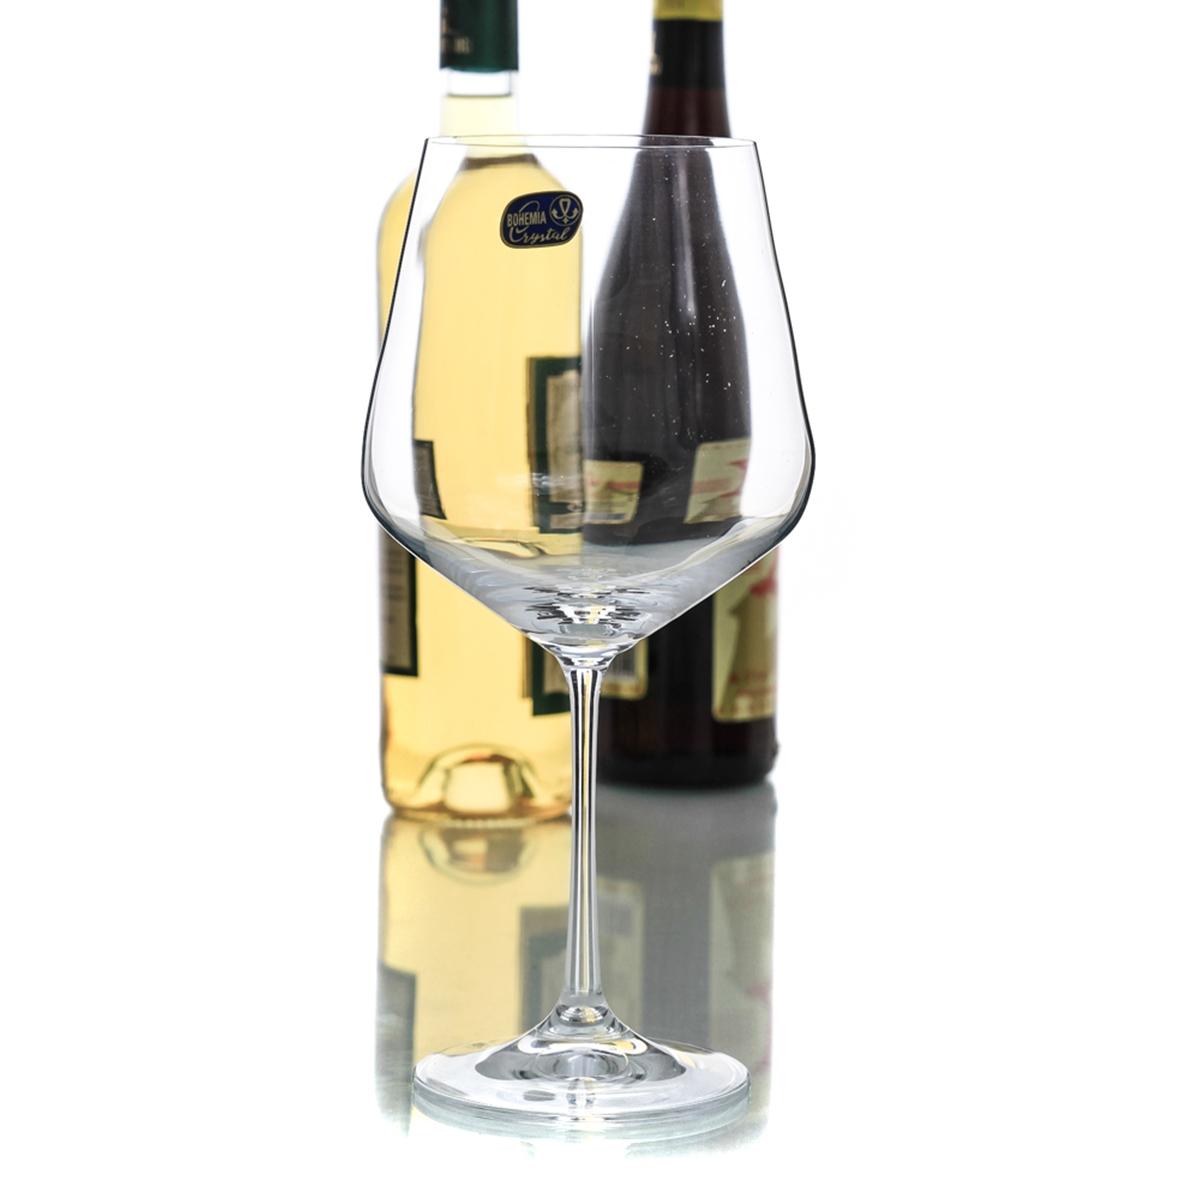 Sandra Set 6 Pahare Cristalin Burgundy 570 Ml 2021 aranjareamesei.ro